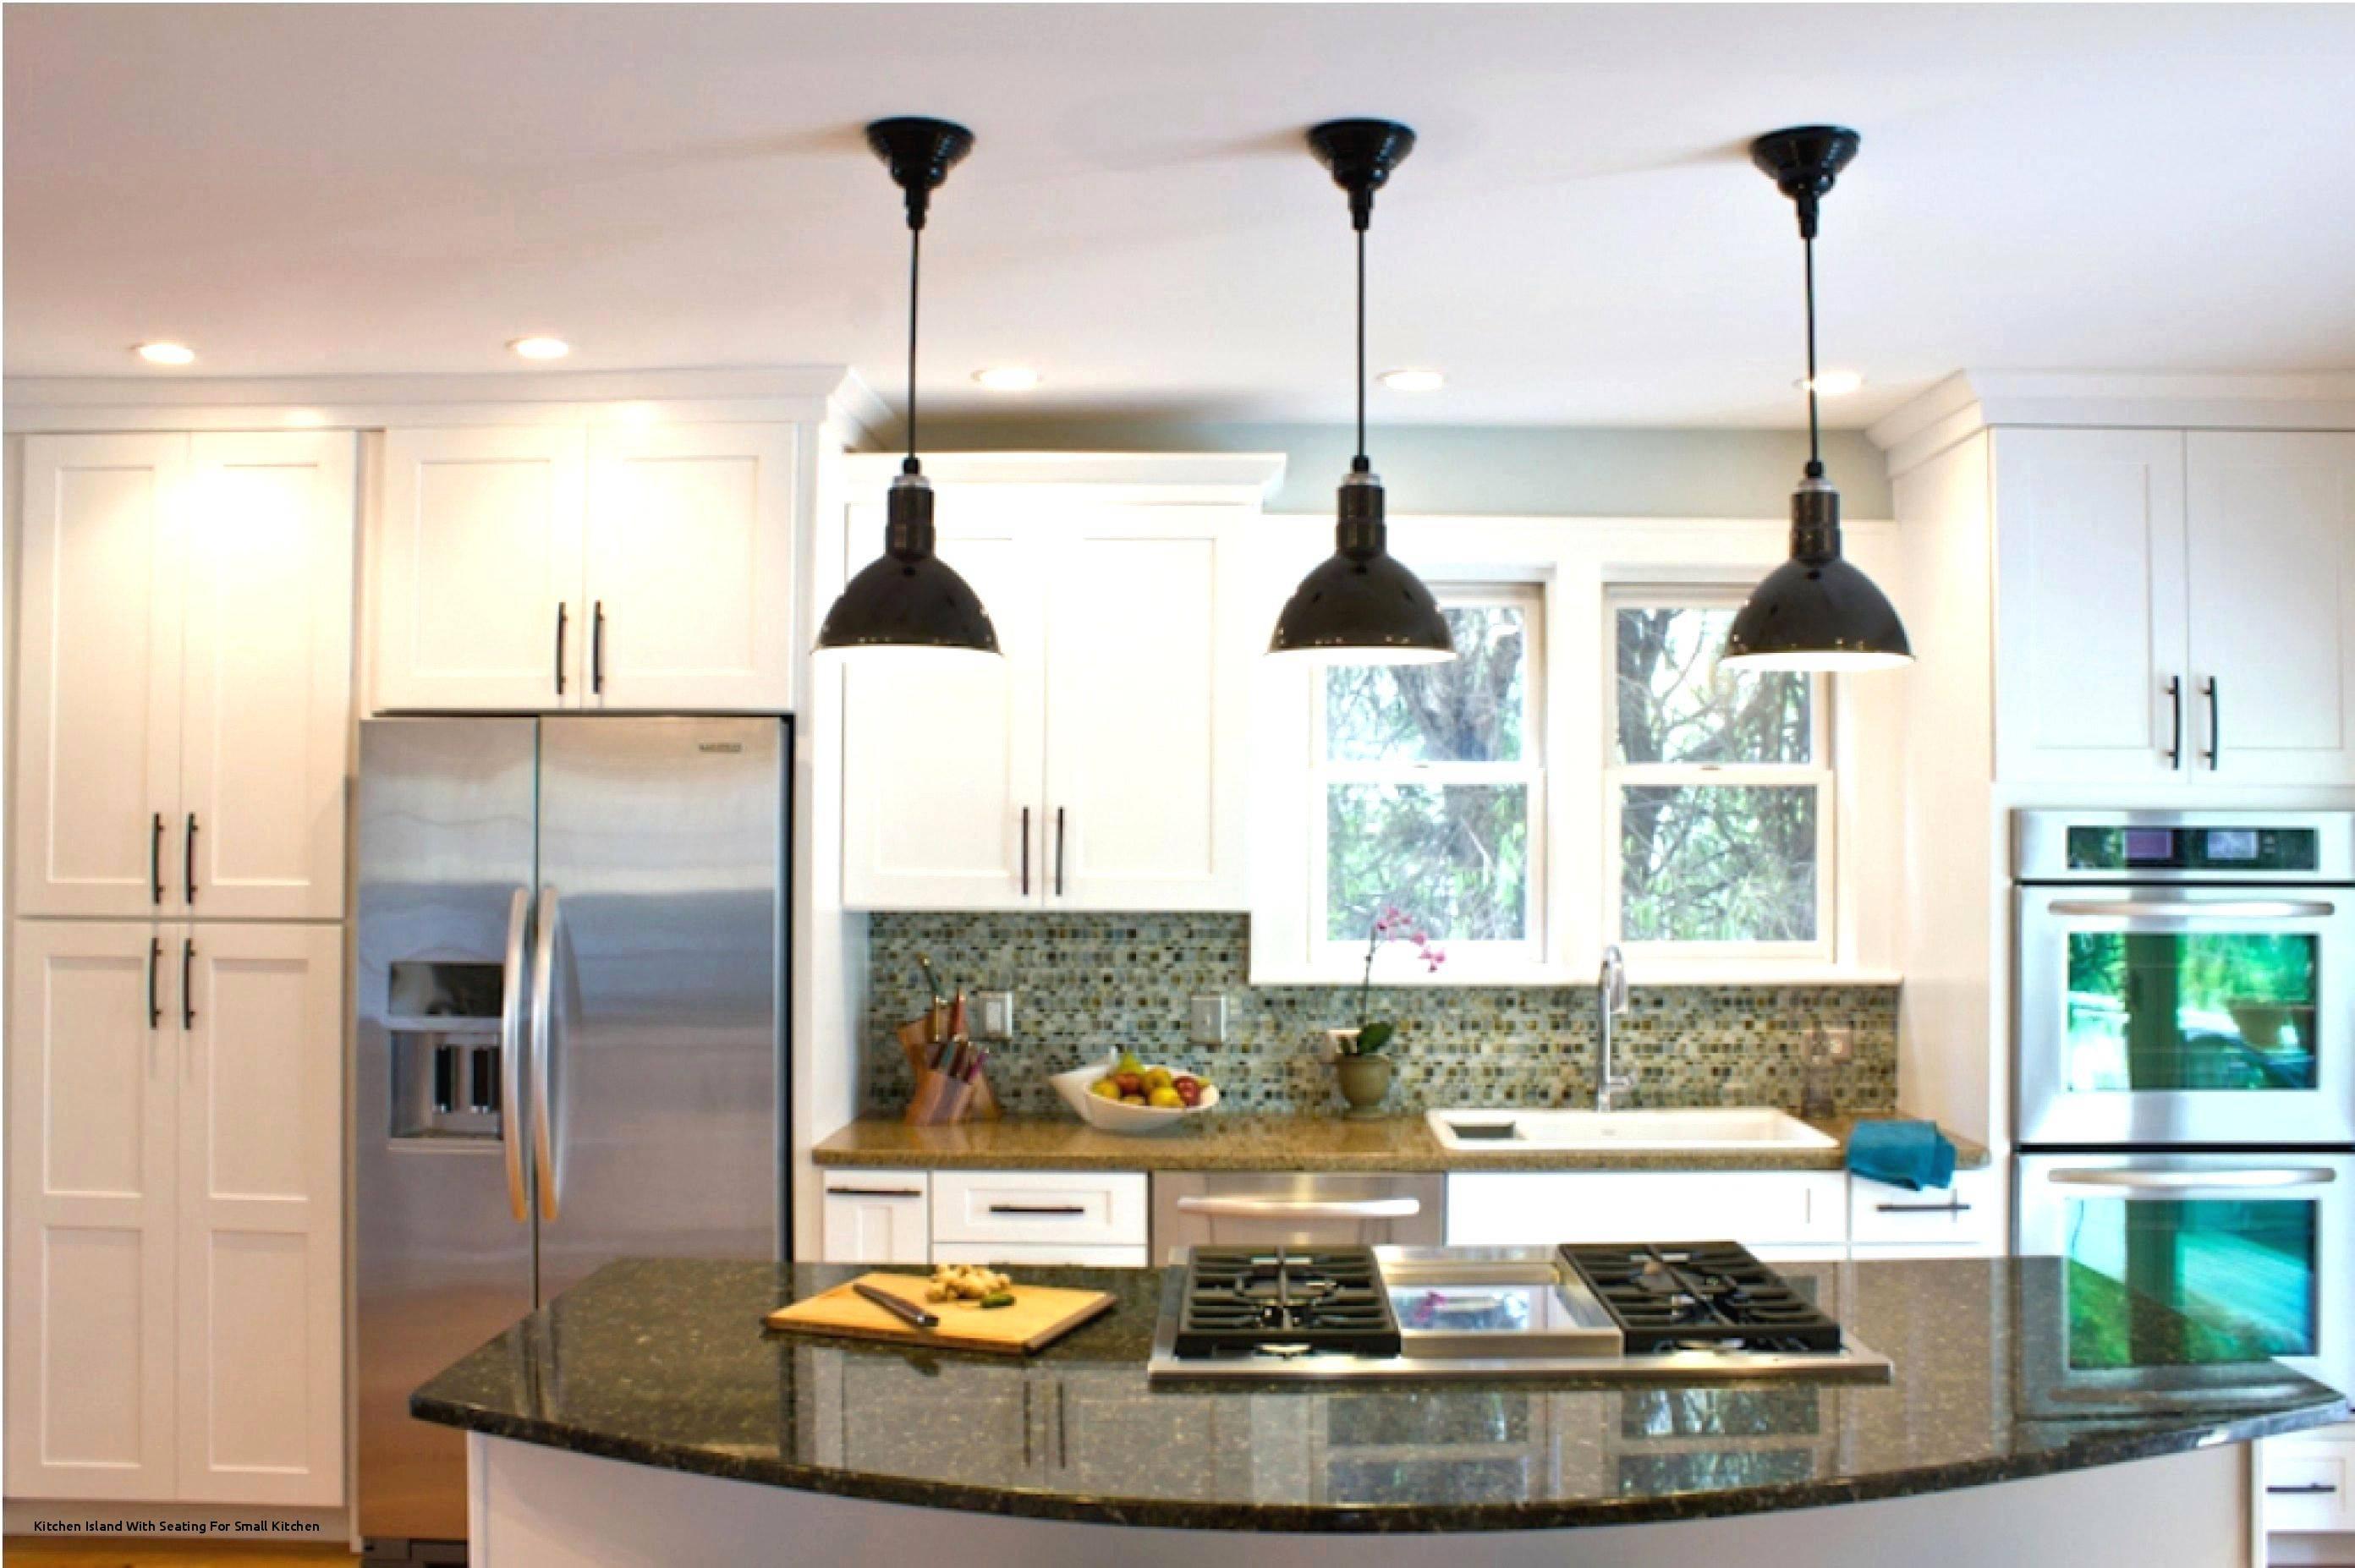 small kitchen ideas with island unique 19 luxury small kitchen with an island liguefrancilienne collection